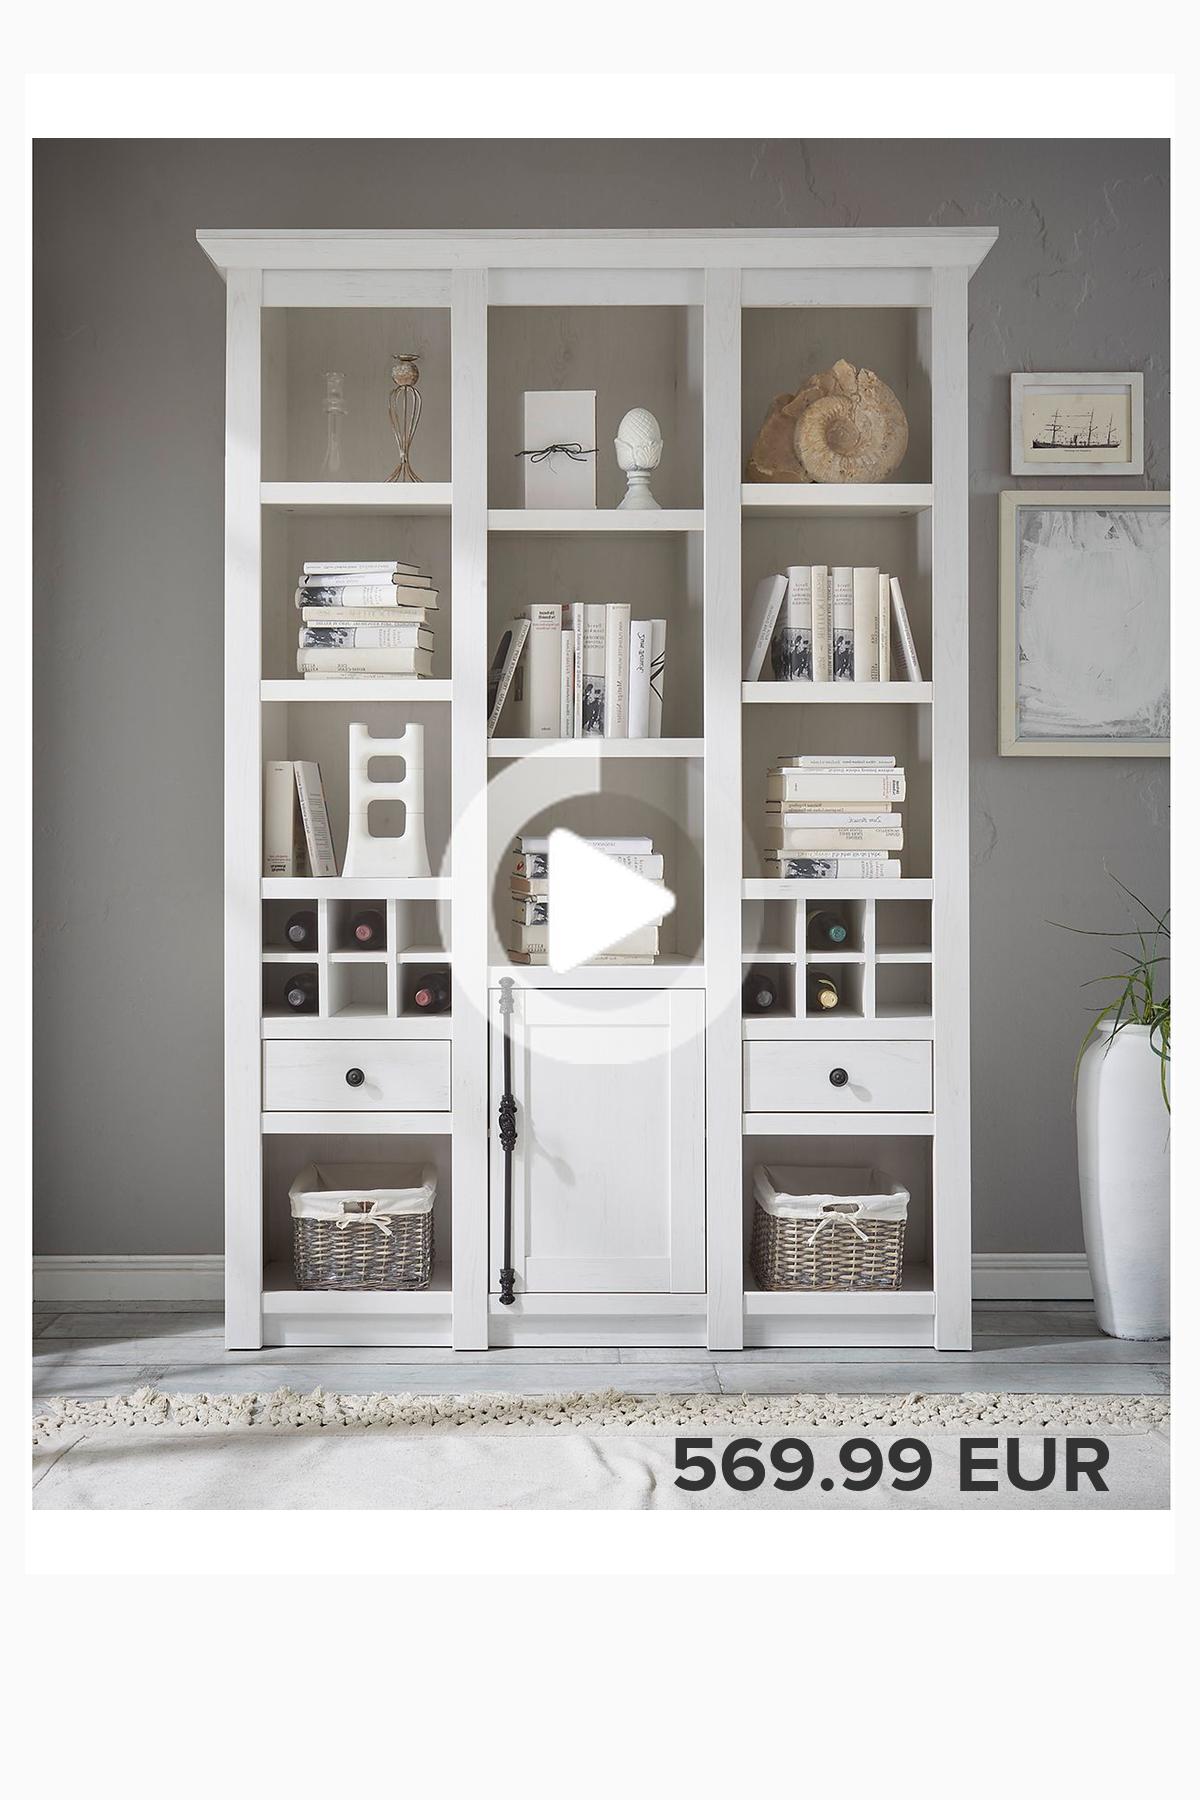 Regal Geestland I kaufen | home24